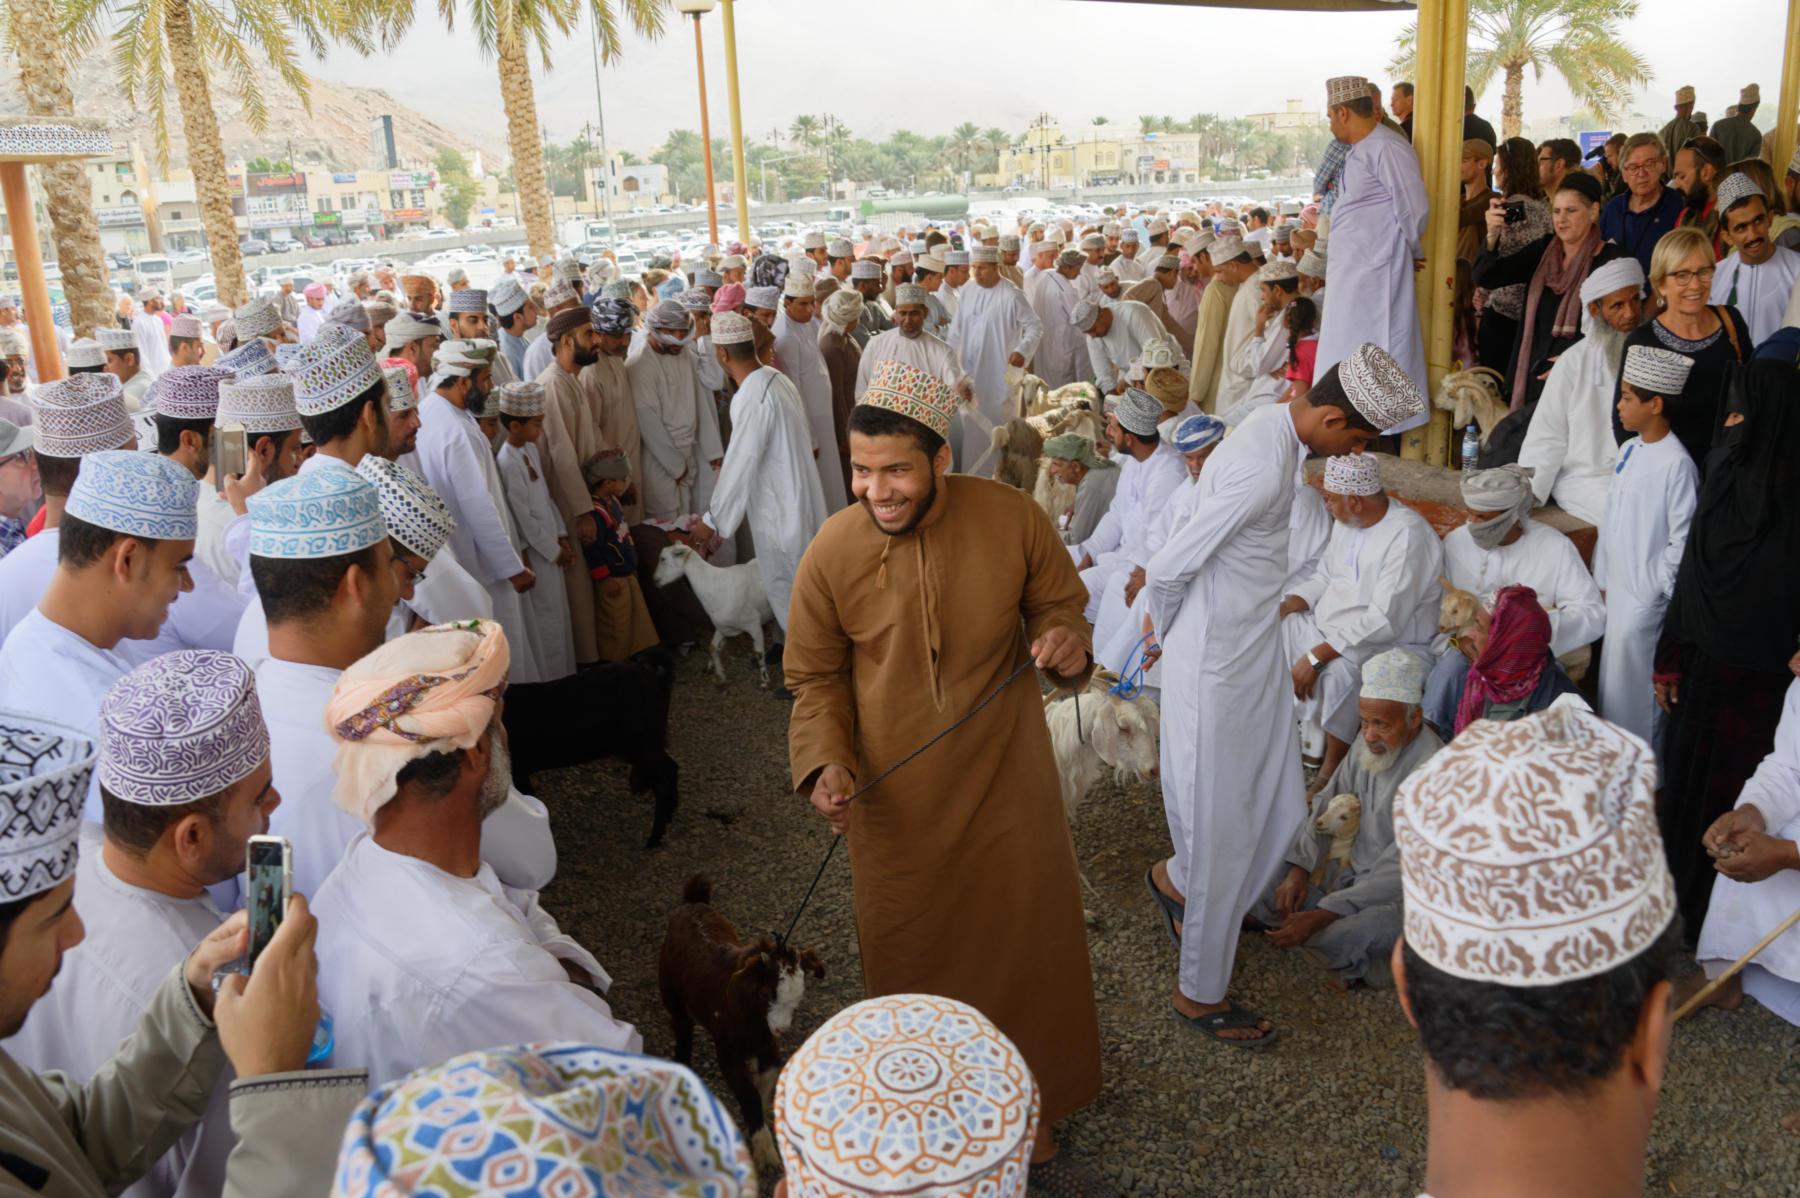 Nizwa Cattle Market Scene, Oman